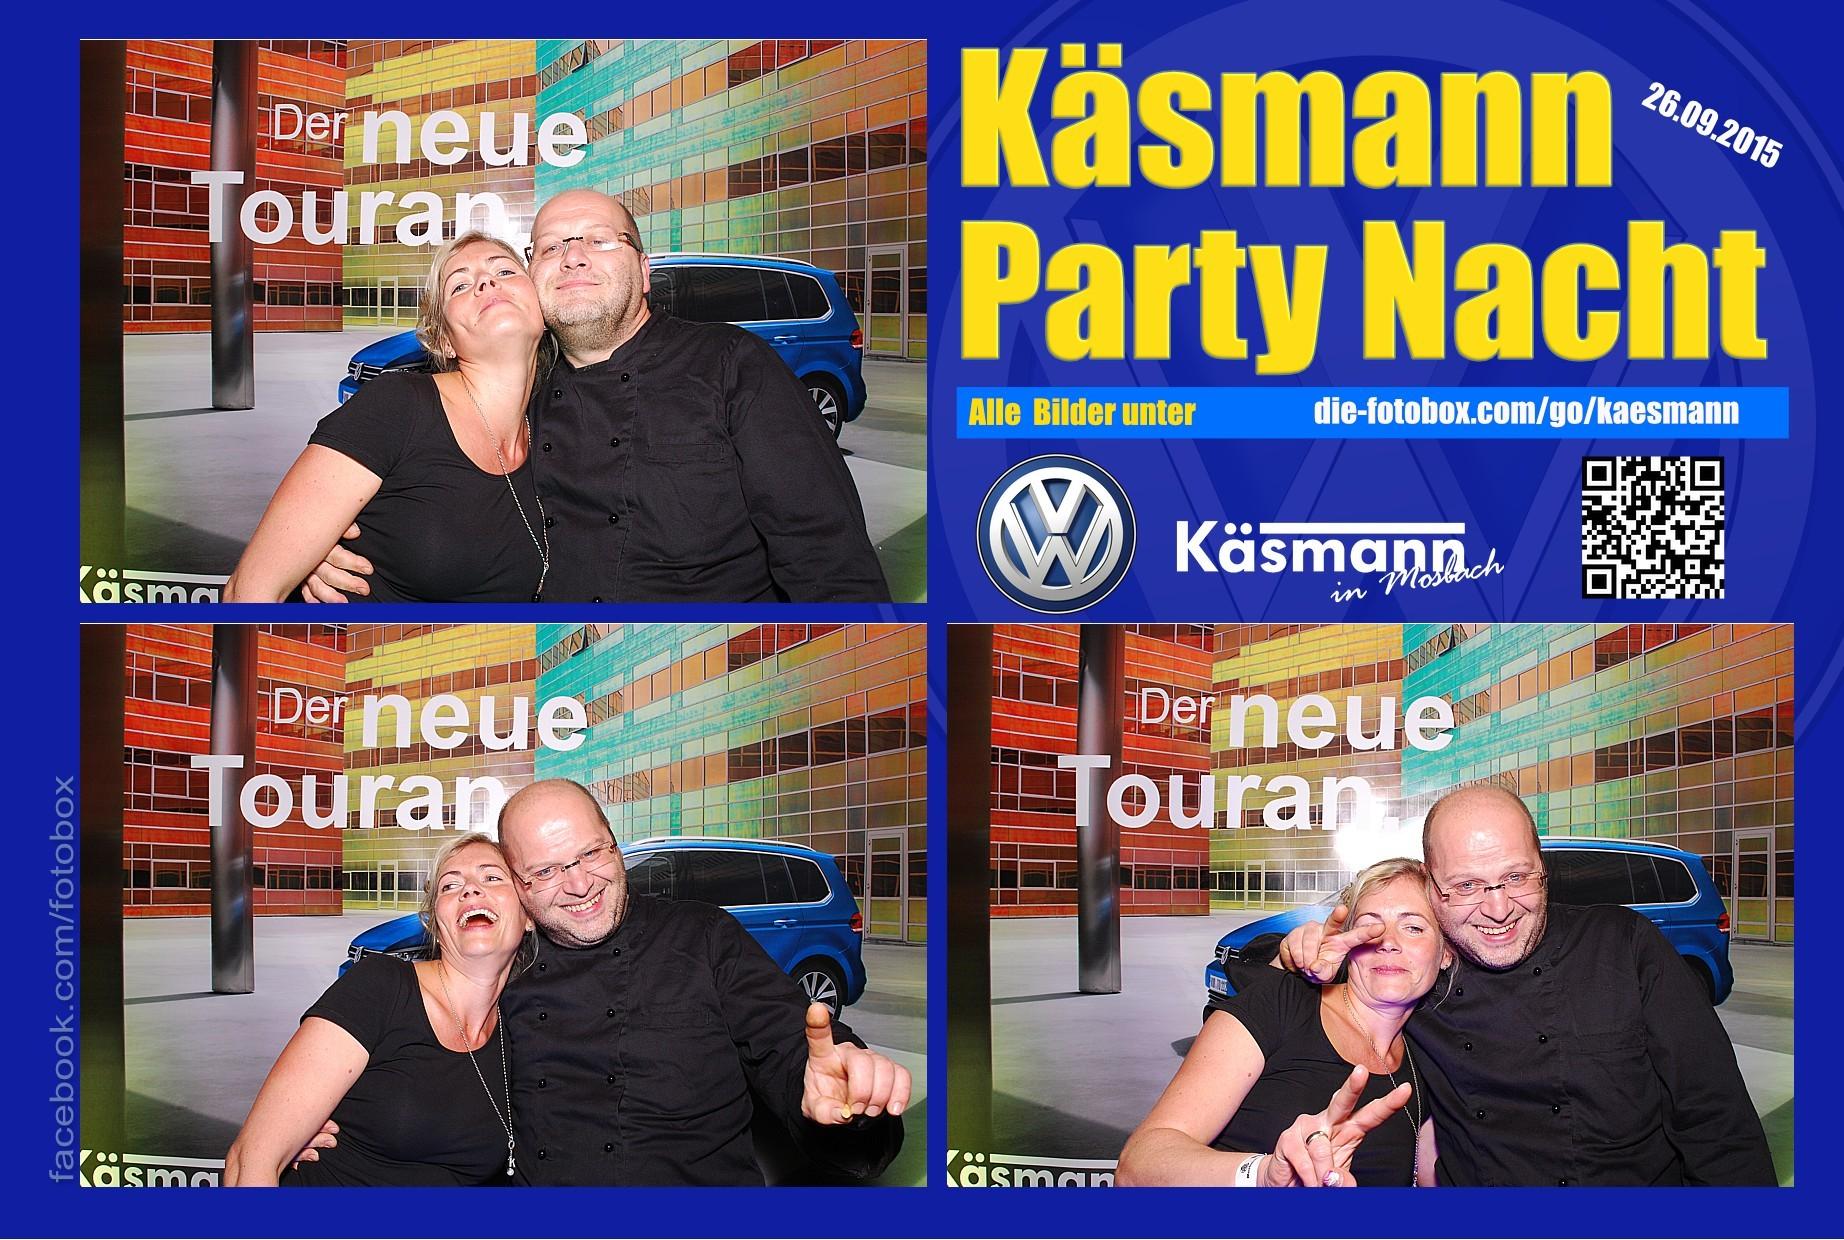 Käsmannparty 2015 - www.die-fotobox.com 01304